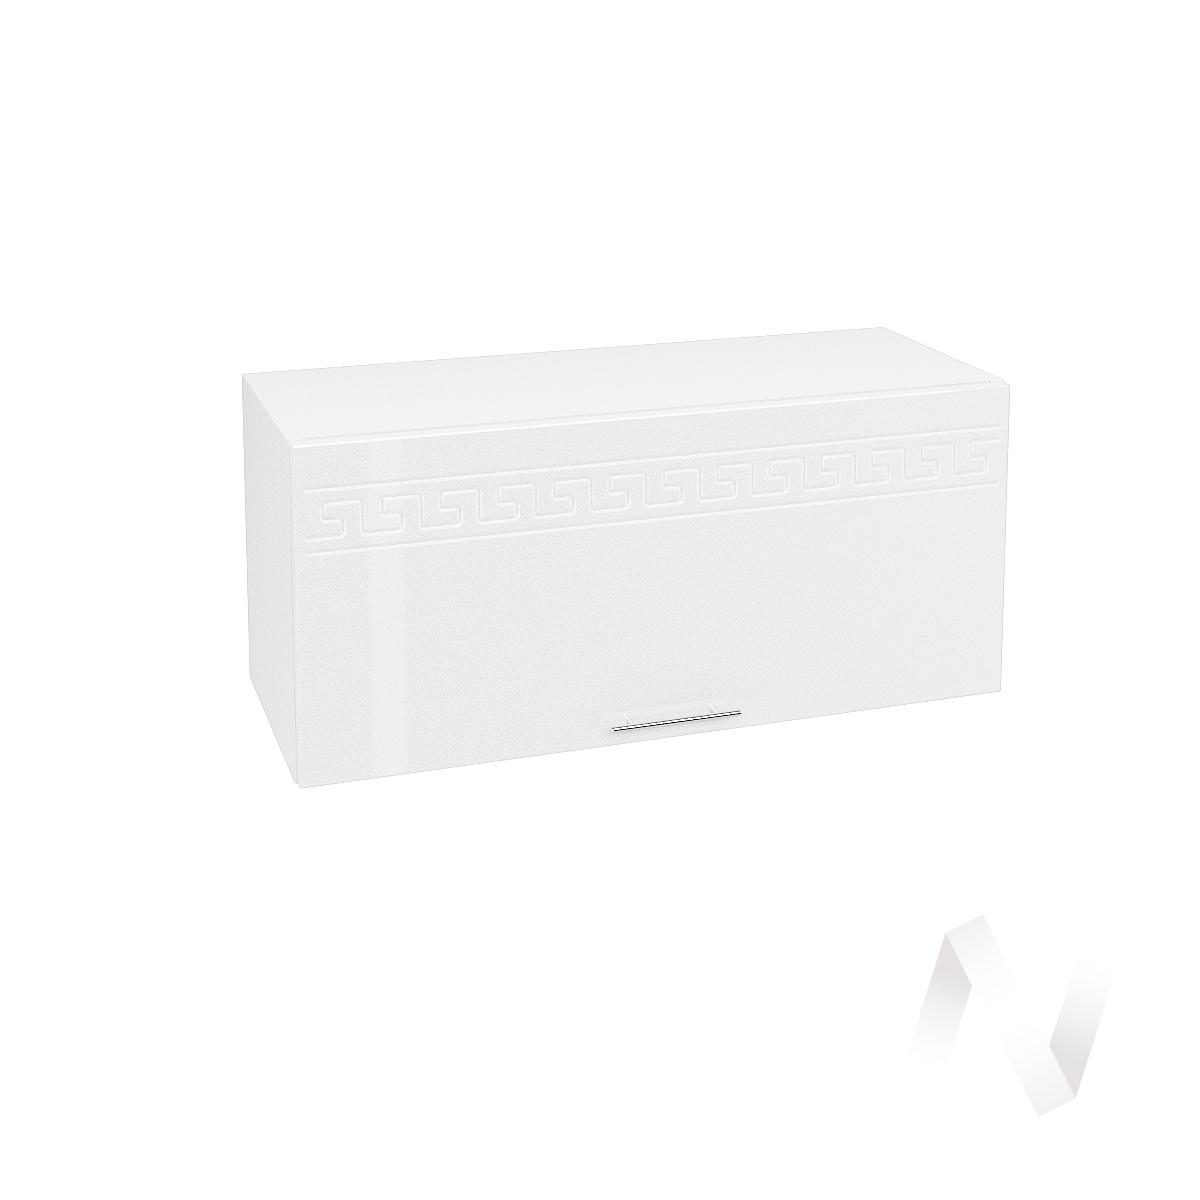 "Кухня ""Греция"": Шкаф верхний горизонтальный 800, ШВГ 800 (белый металлик/корпус белый)"